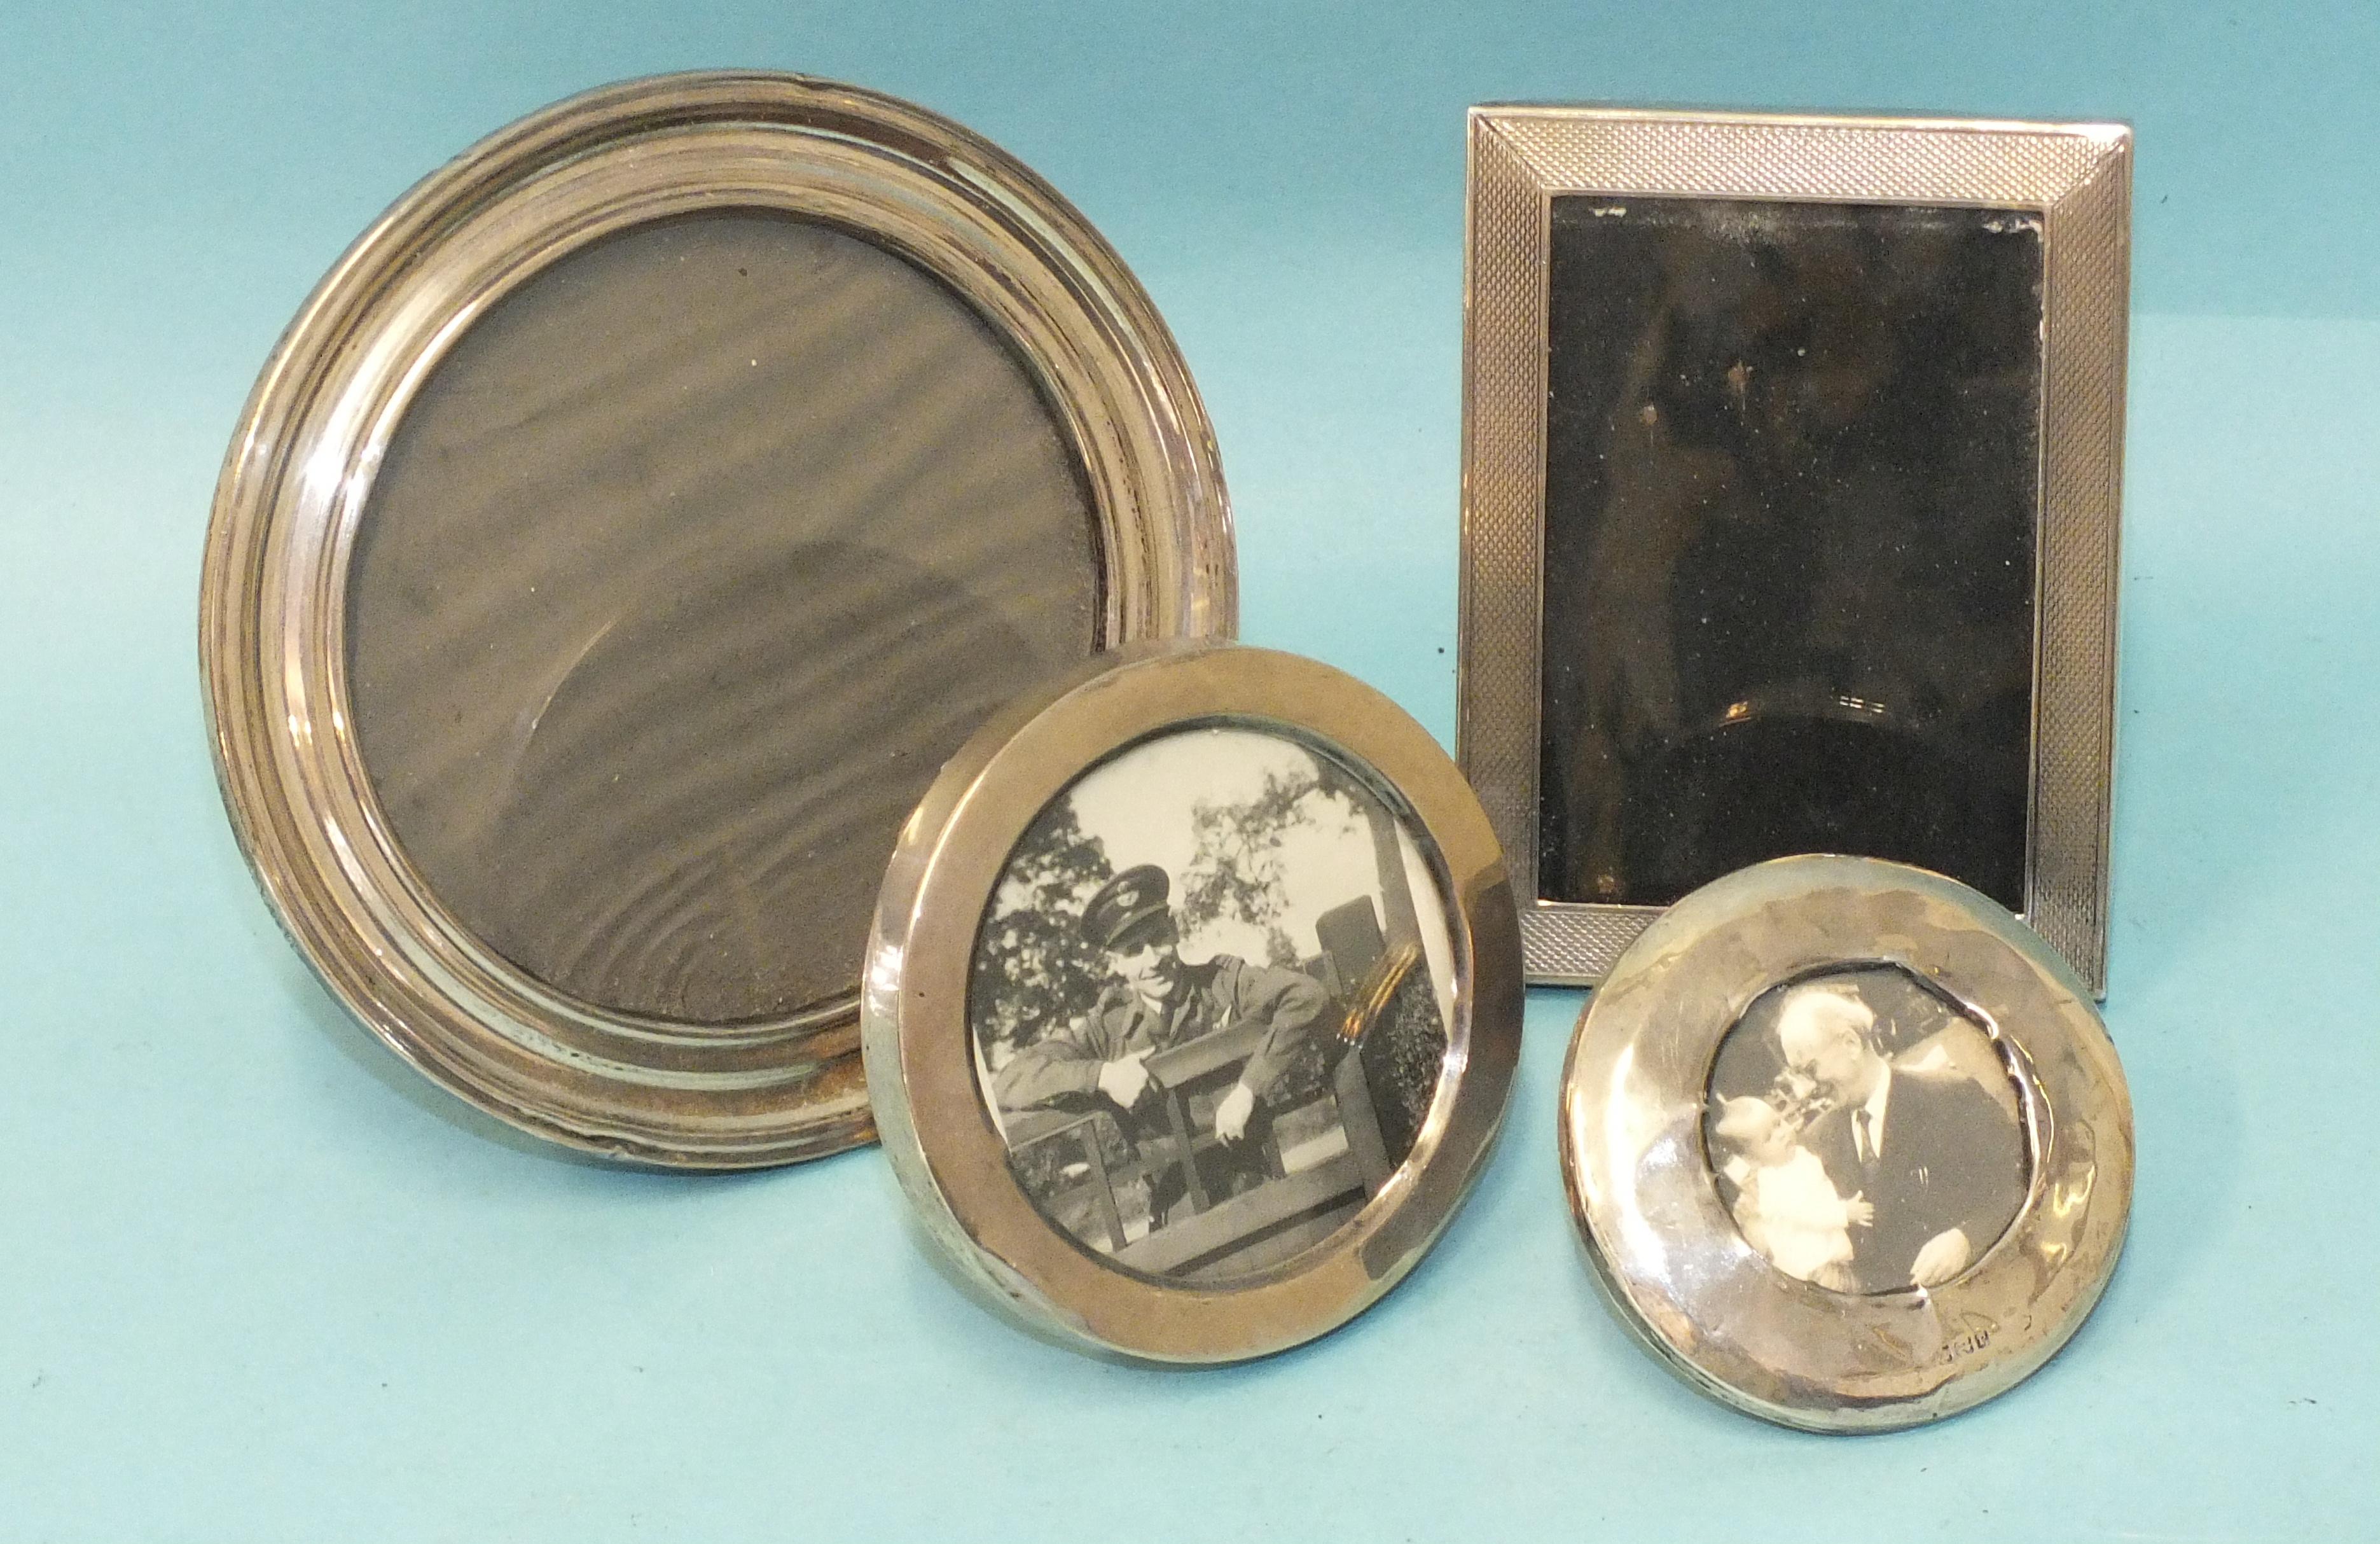 A small engine-turned silver photograph frame, 7.3 x 9.8cm, Birmingham 1950 and three circular